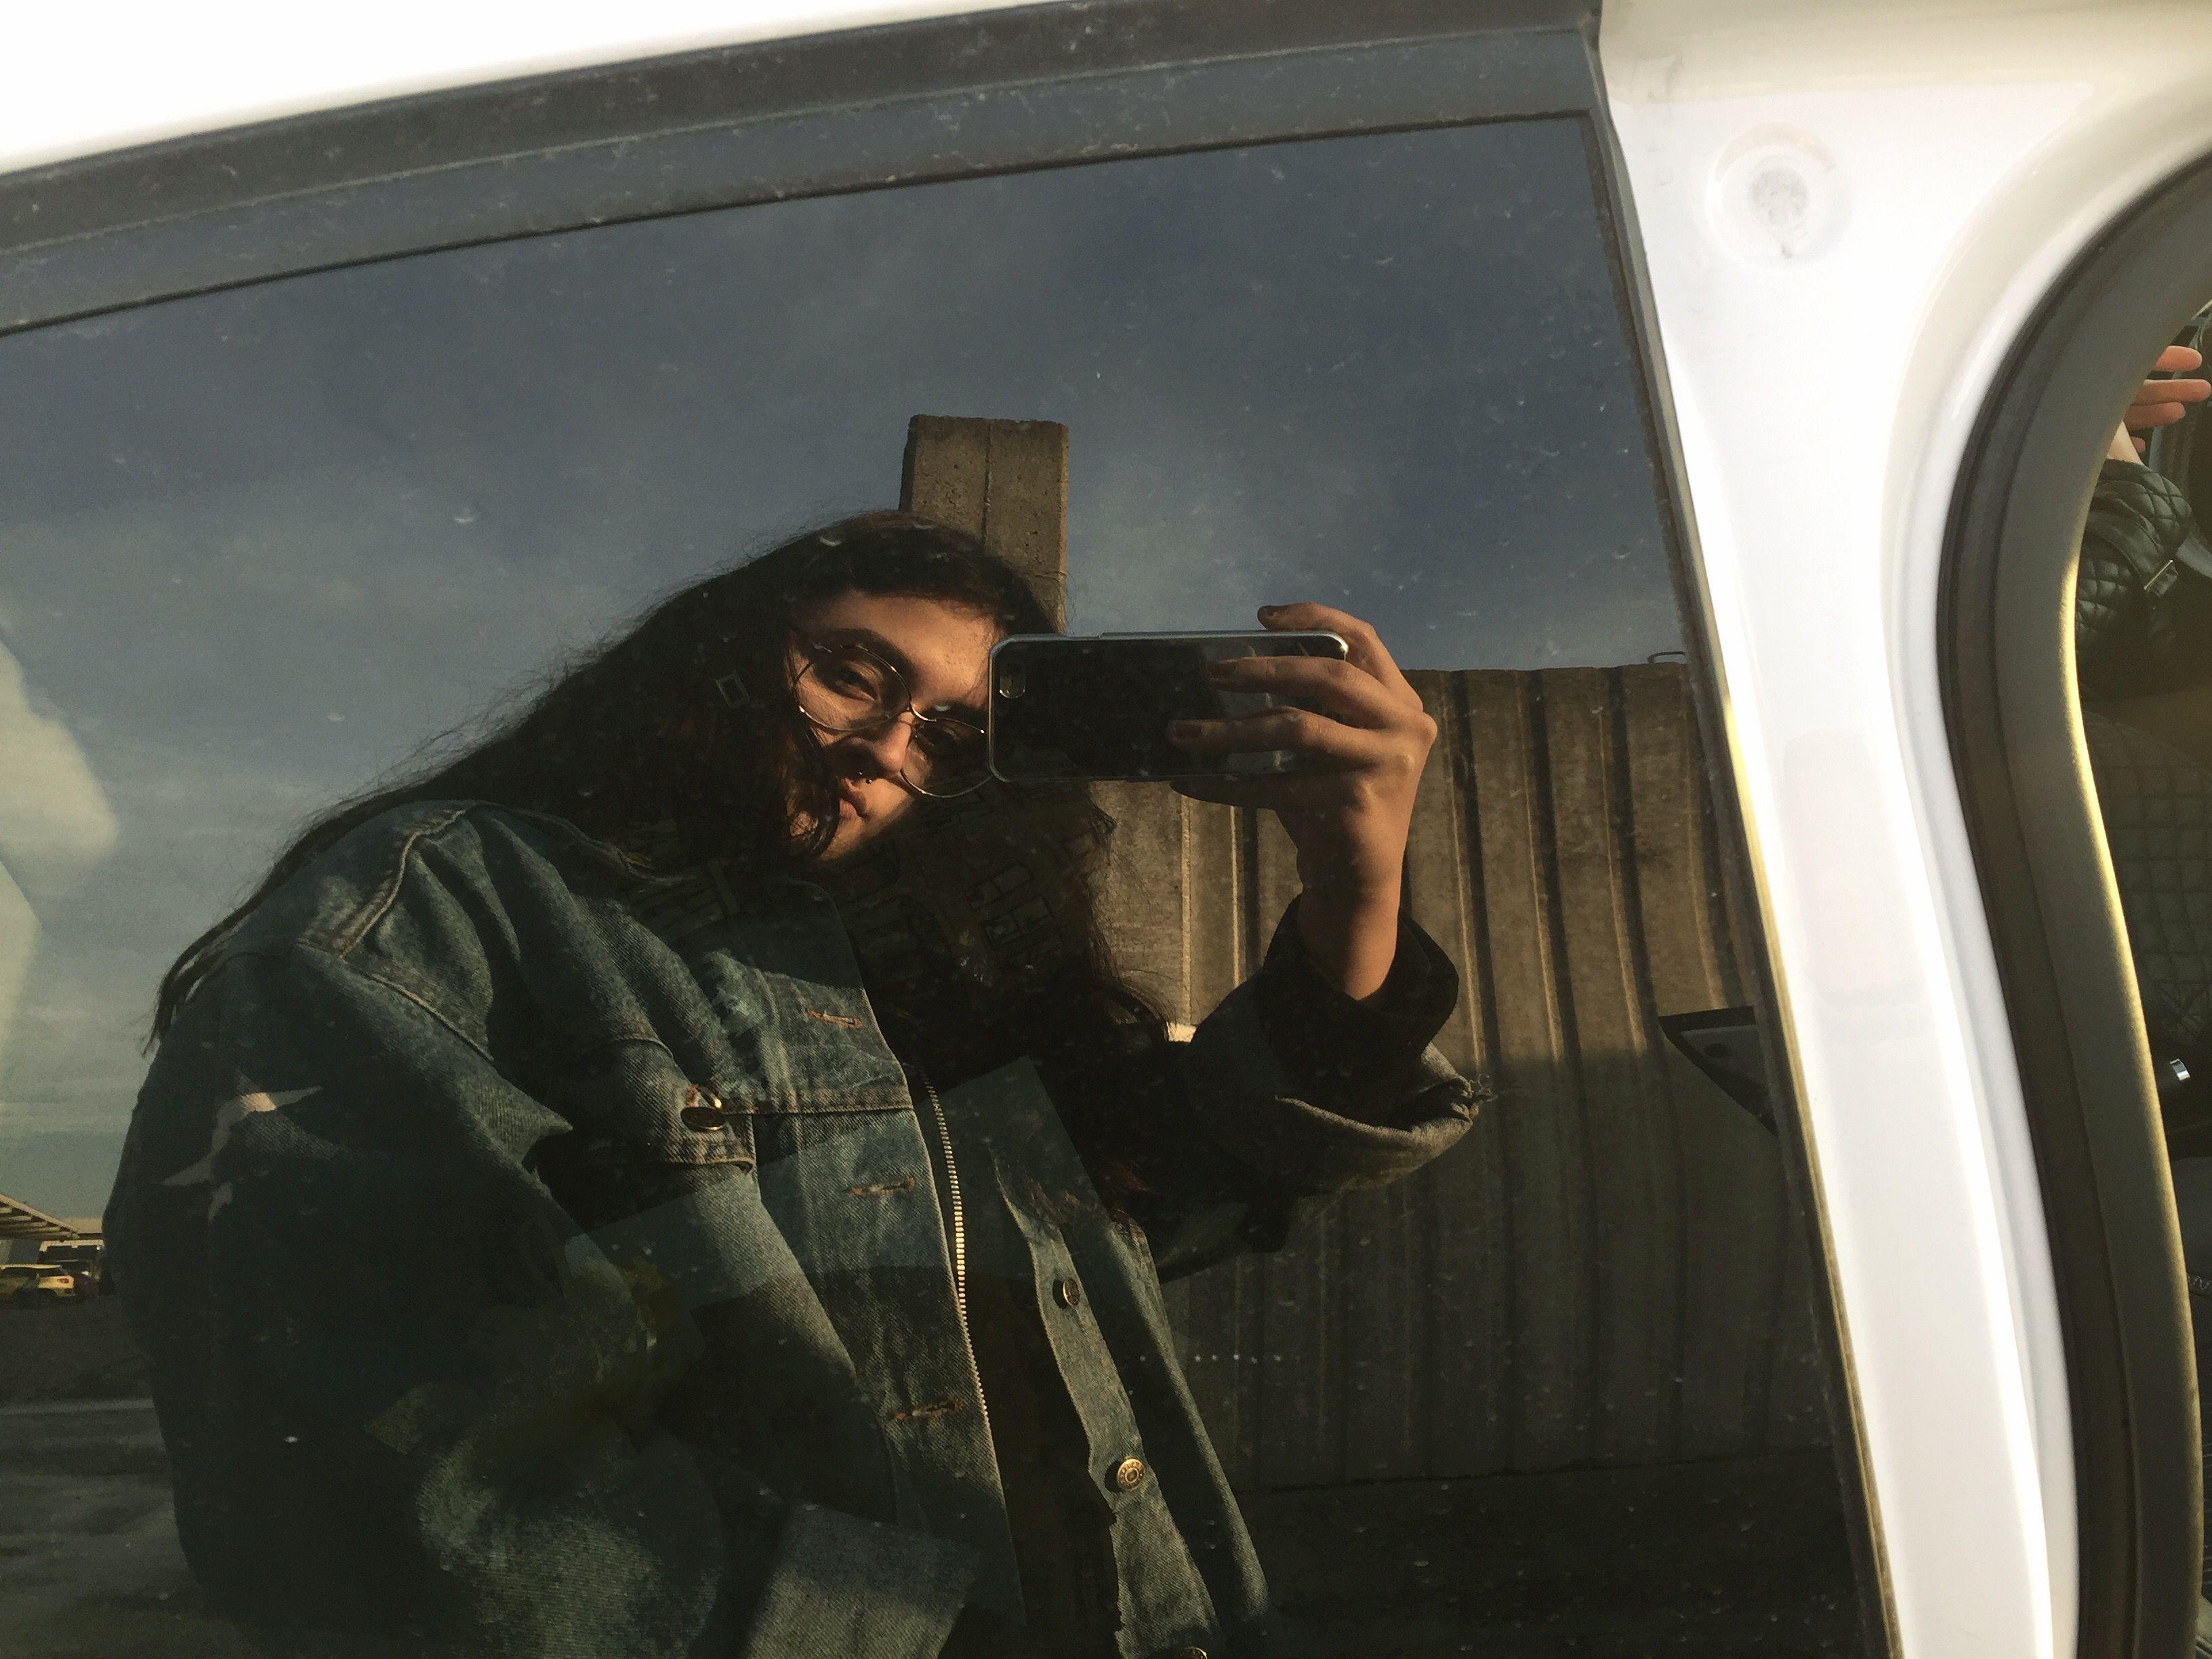 Tumblr Instagram Mirror Selfie Denim Jacket 90s Mirror